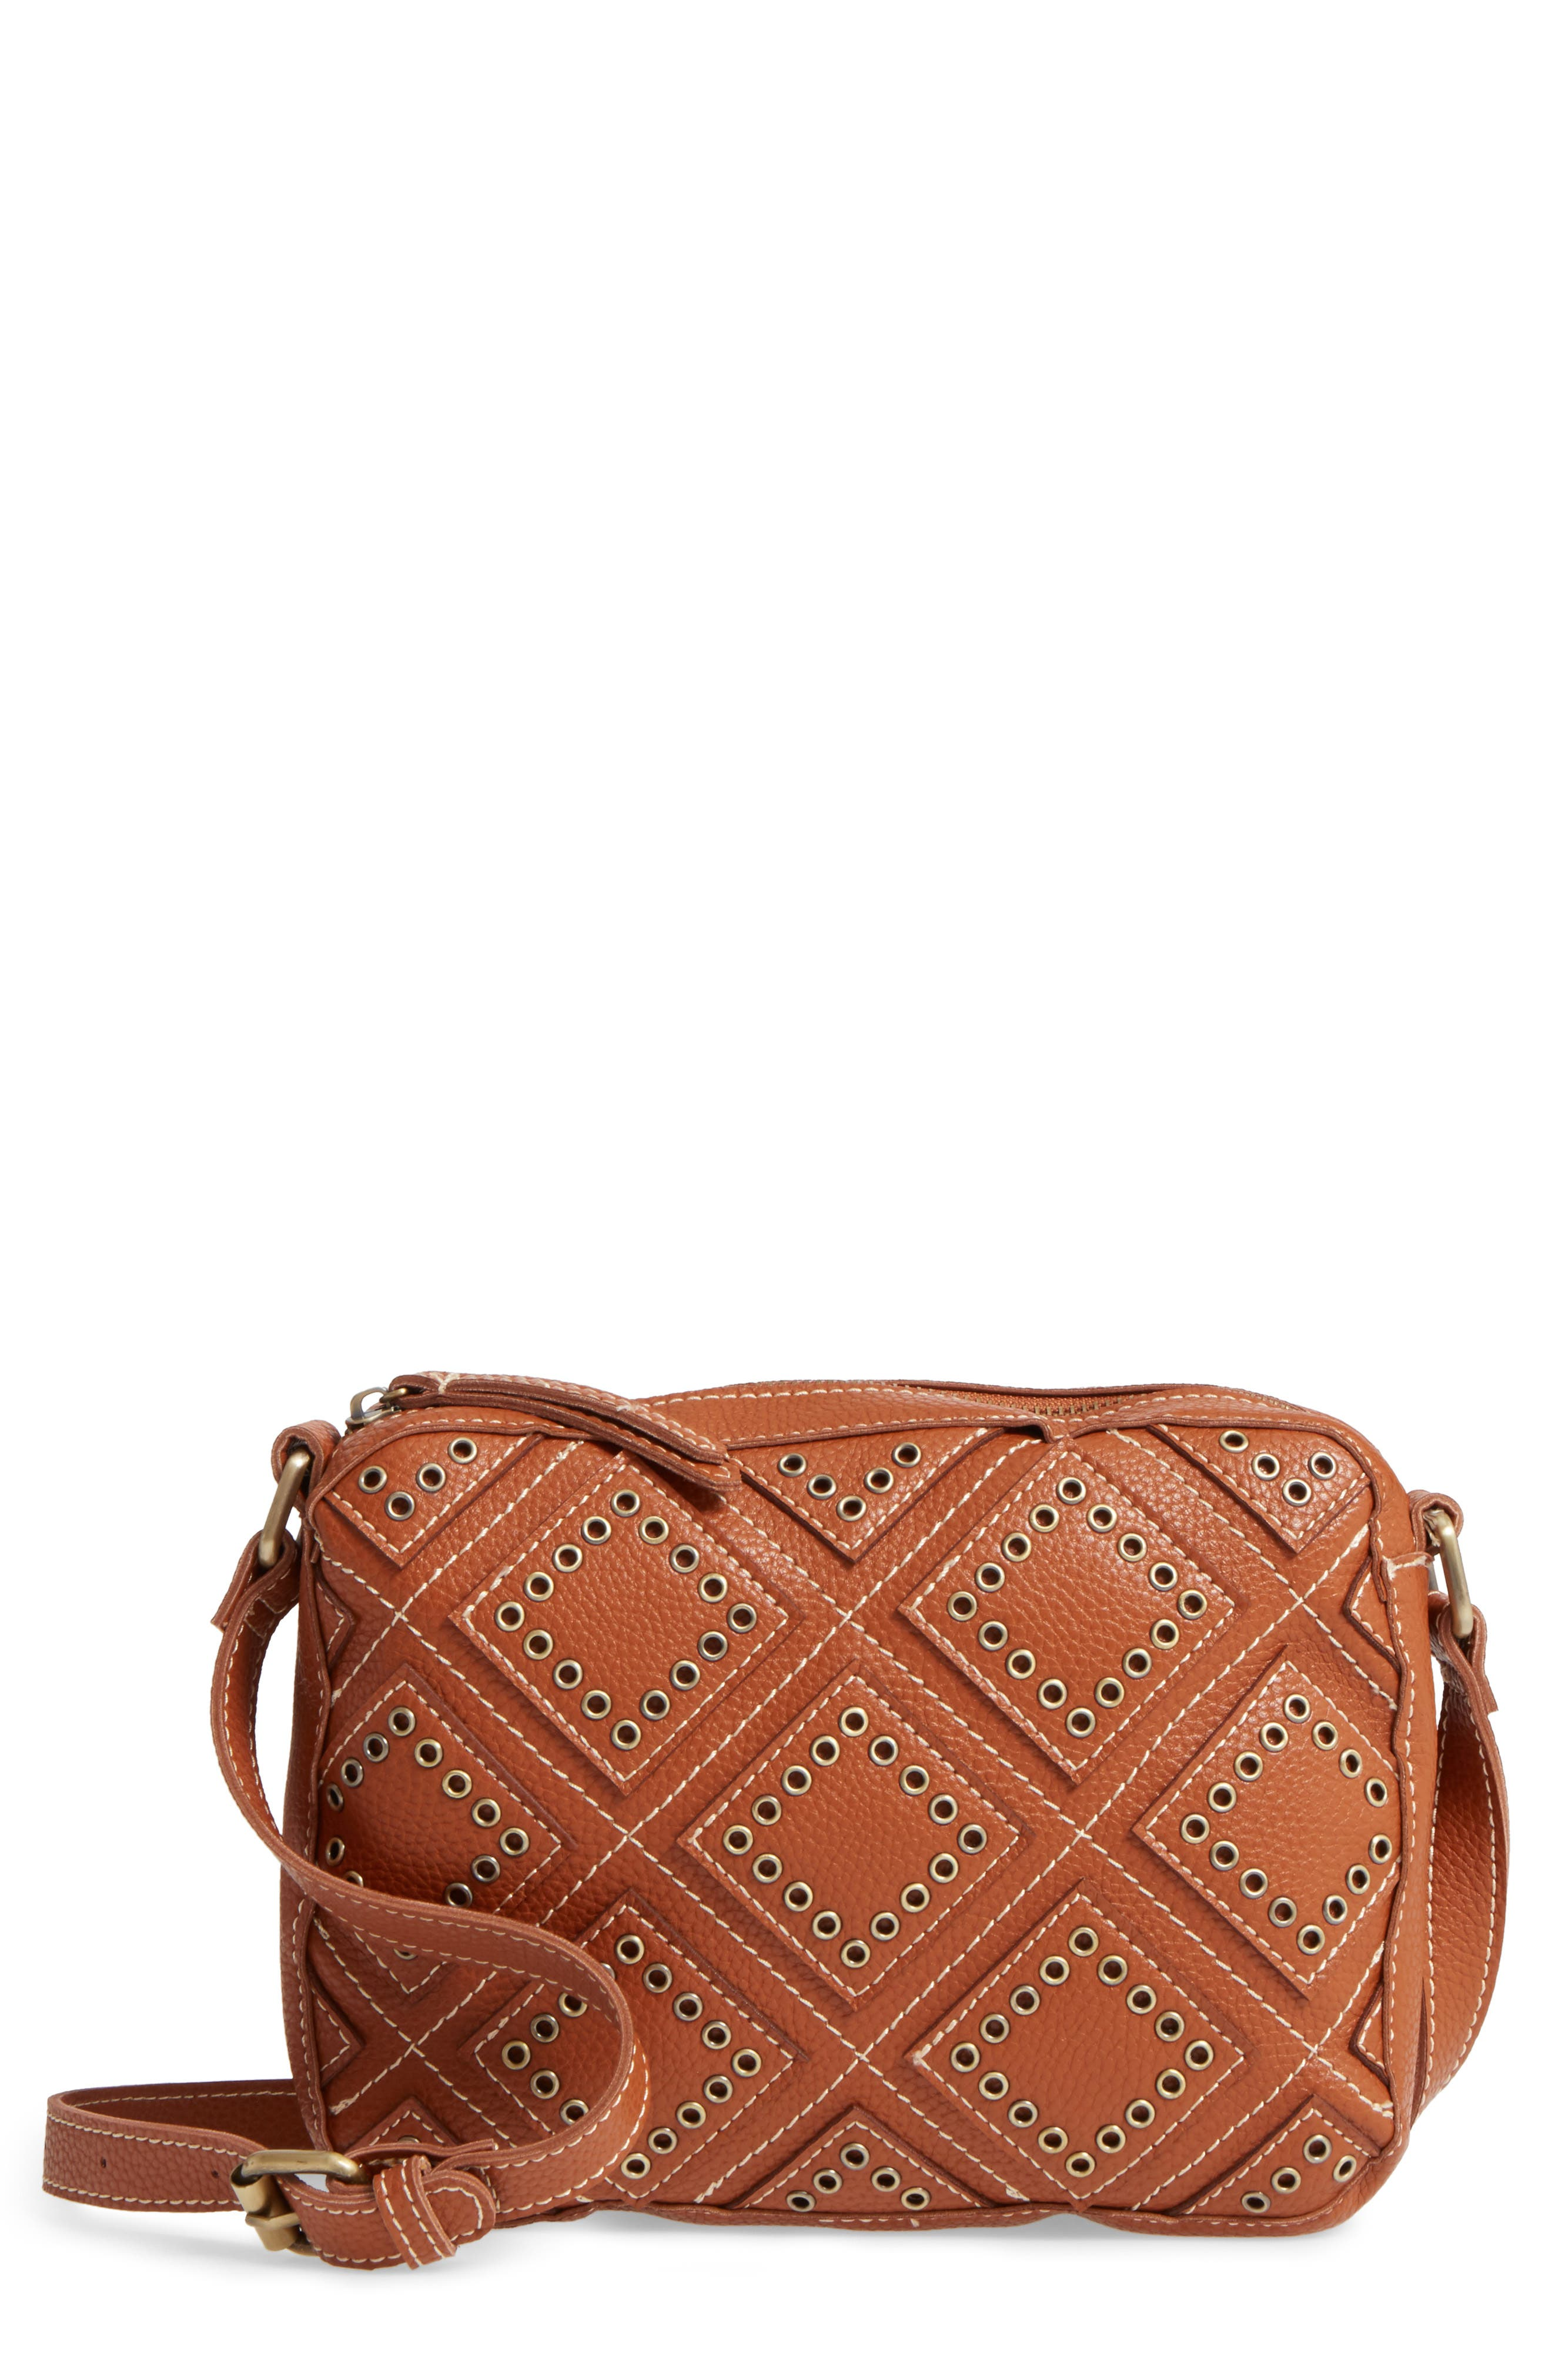 Skylar Faux Leather Crossbody Bag,                             Main thumbnail 1, color,                             211